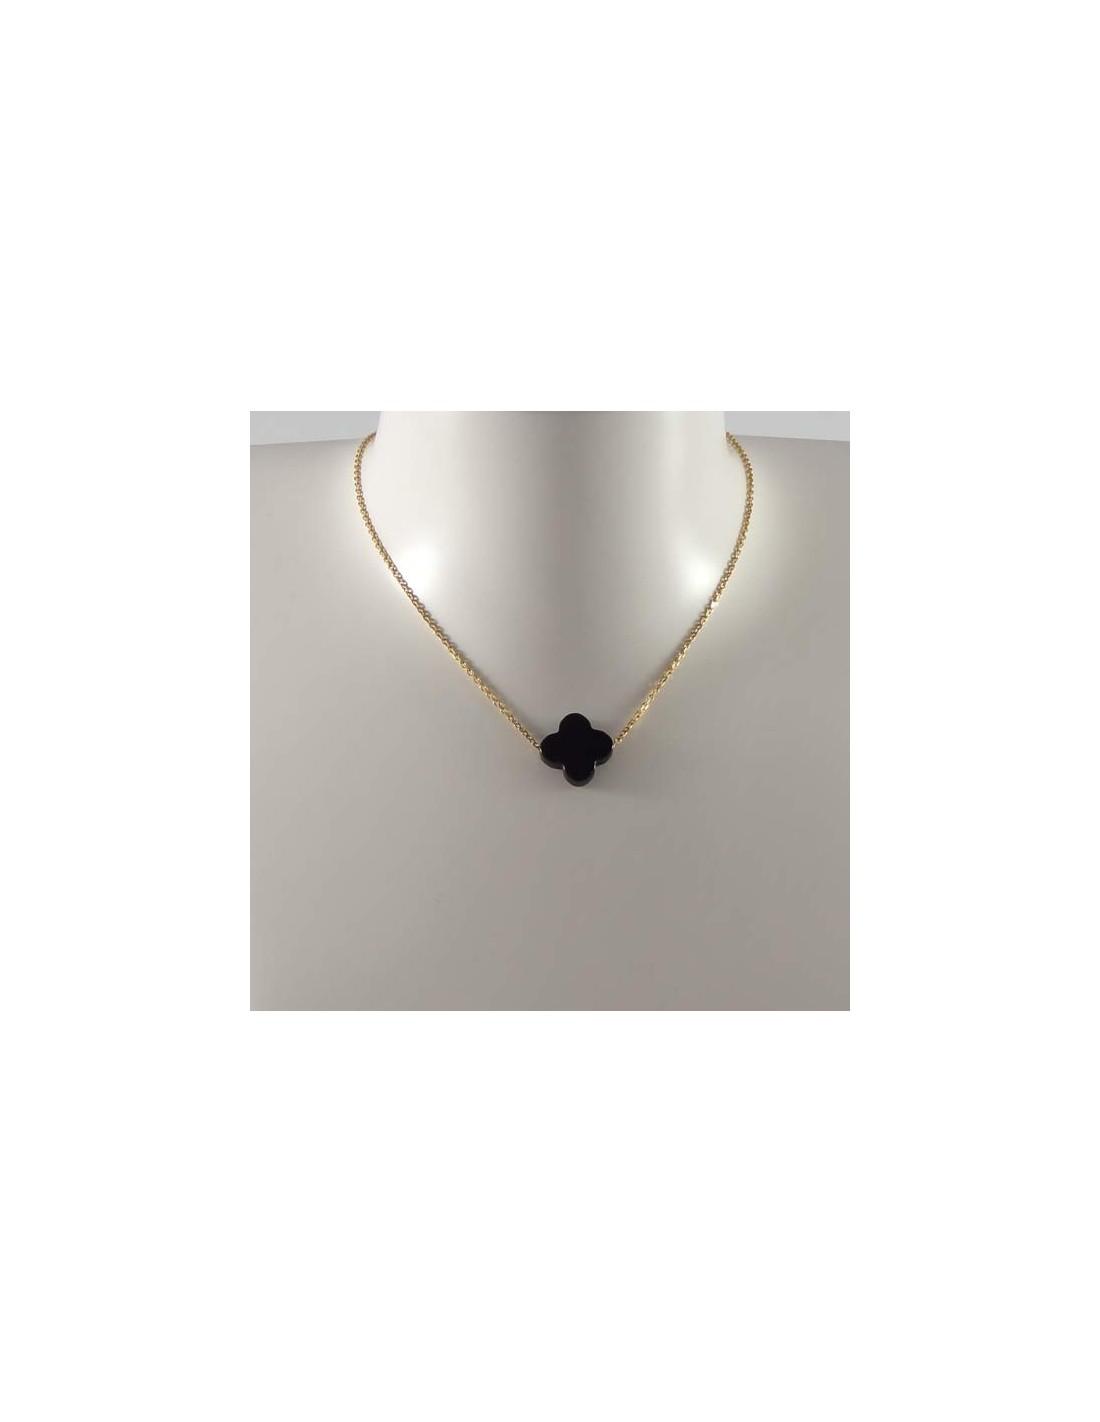 collier chaine plaqu or croix onyx. Black Bedroom Furniture Sets. Home Design Ideas